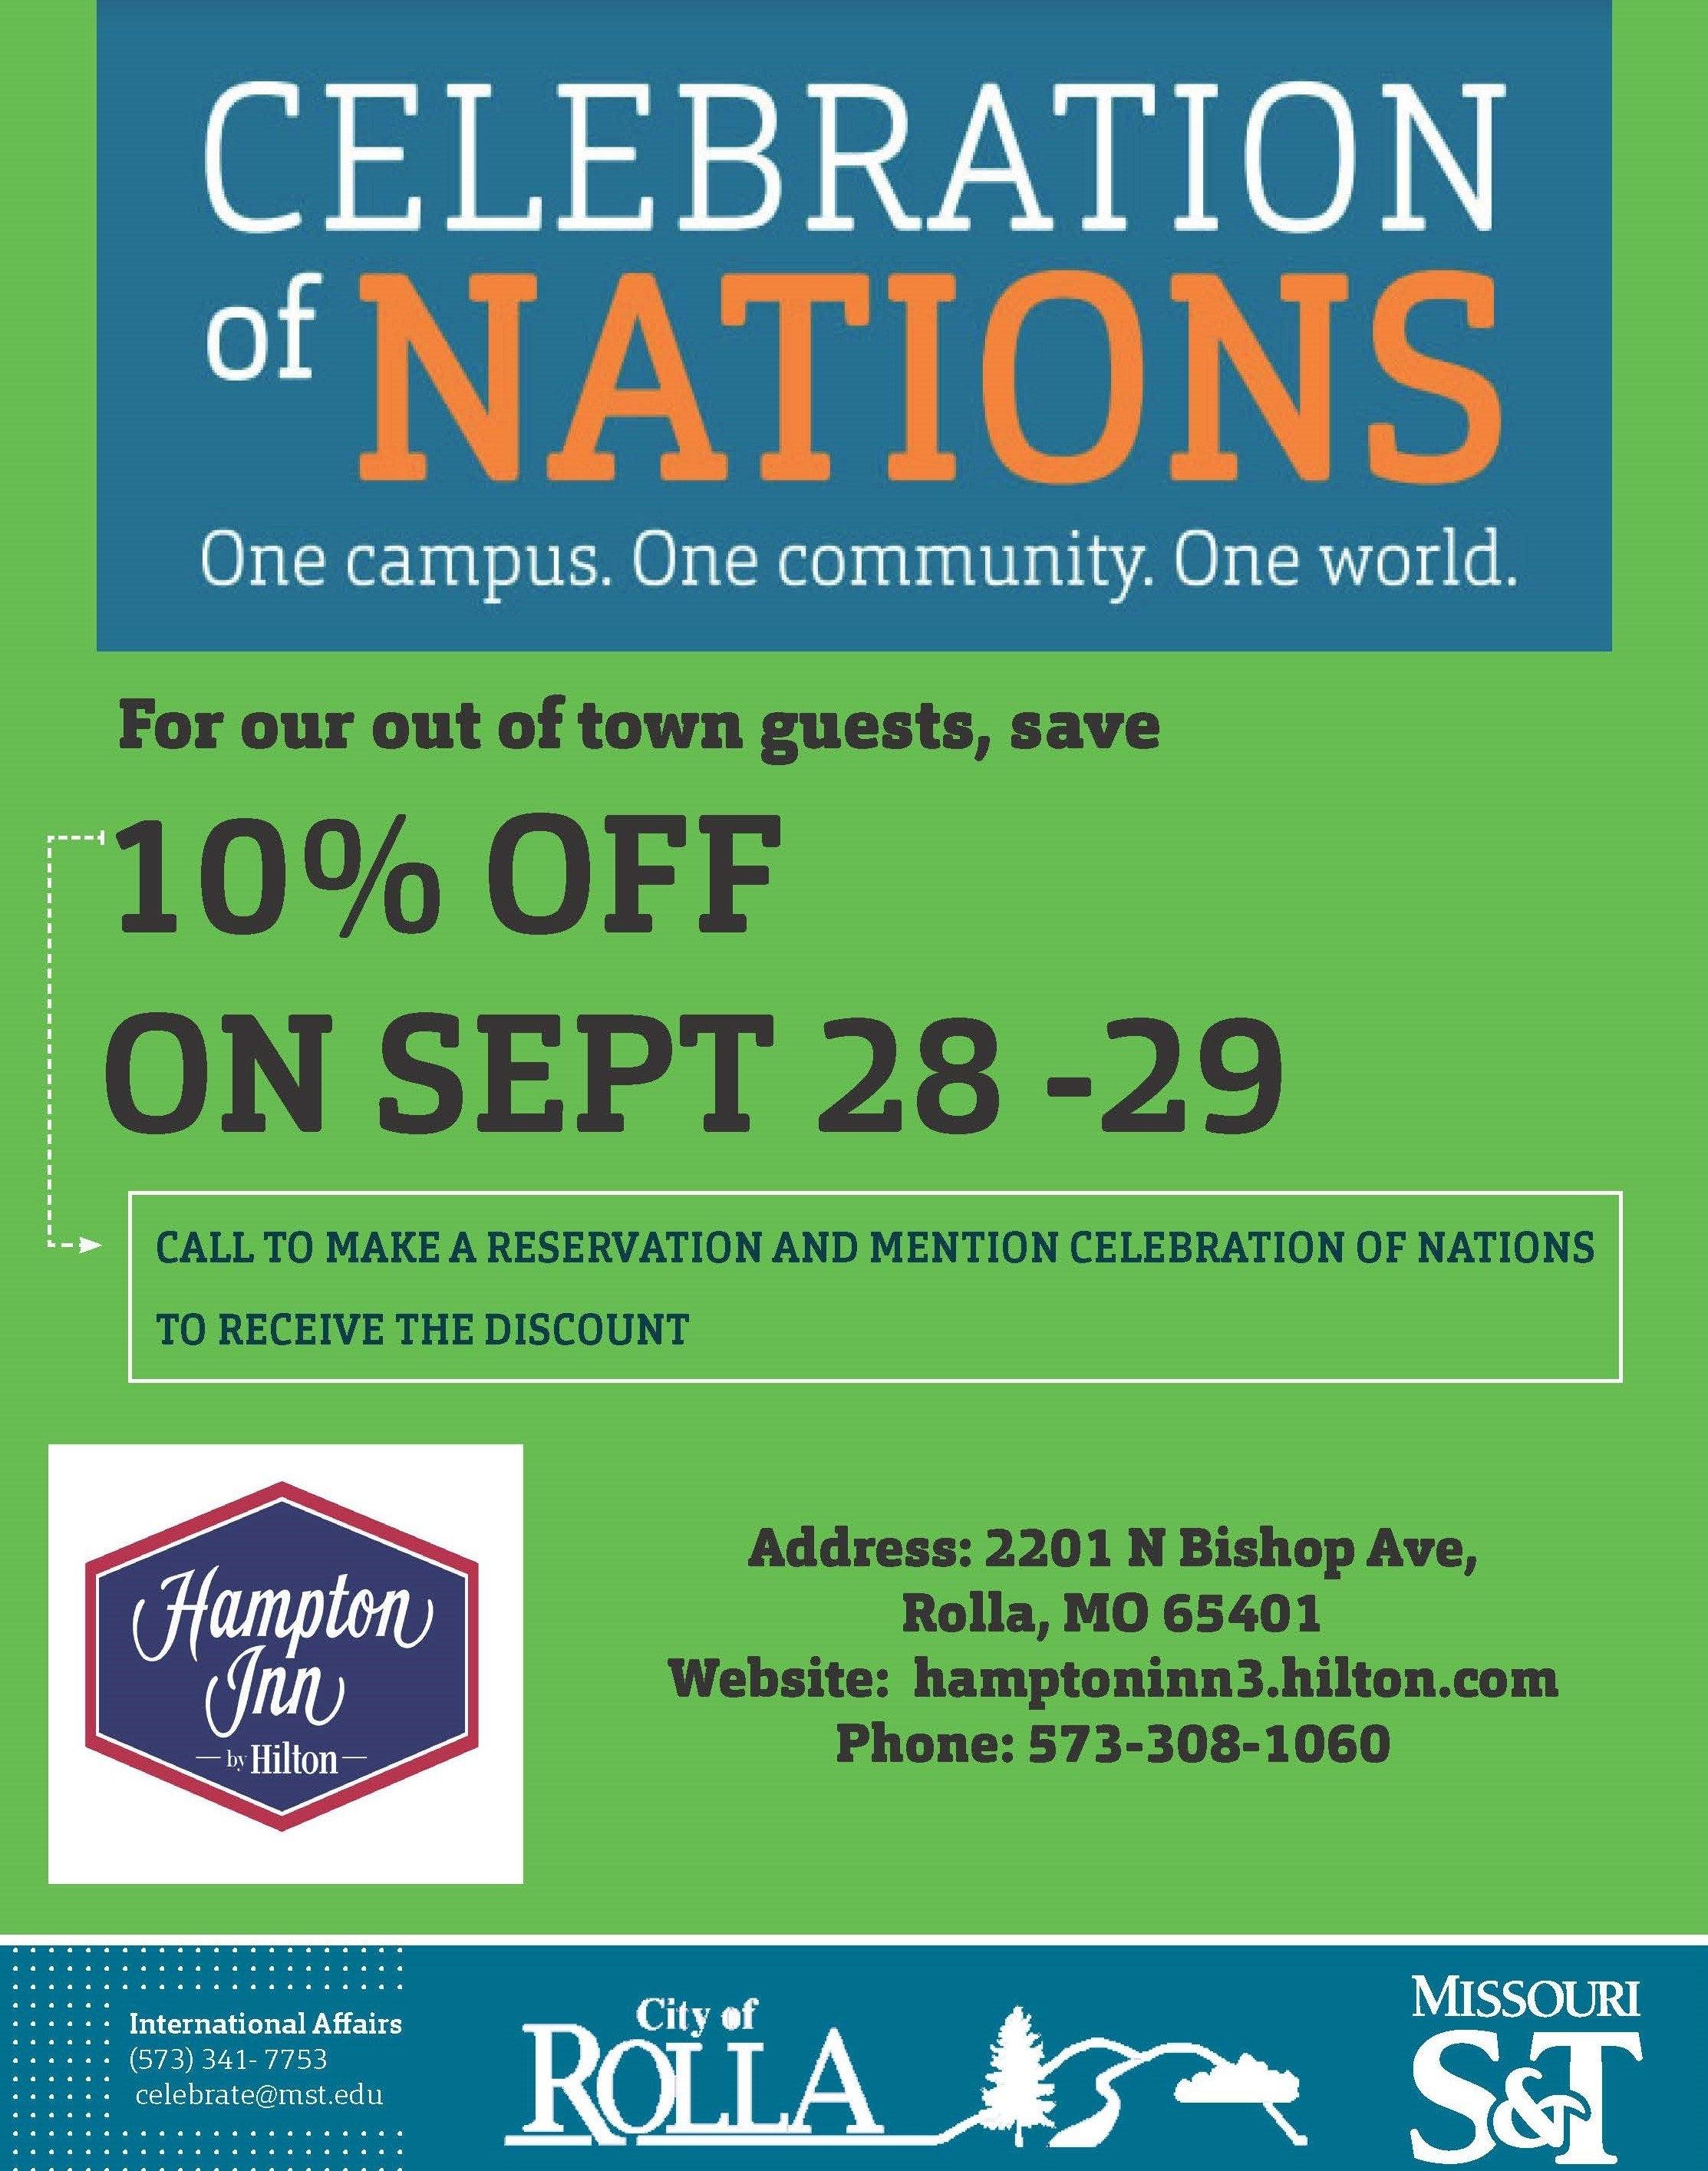 Celebration Of Nations – Celebration Of Nations | Missouri S&t Missouri S&t Calendar 2019